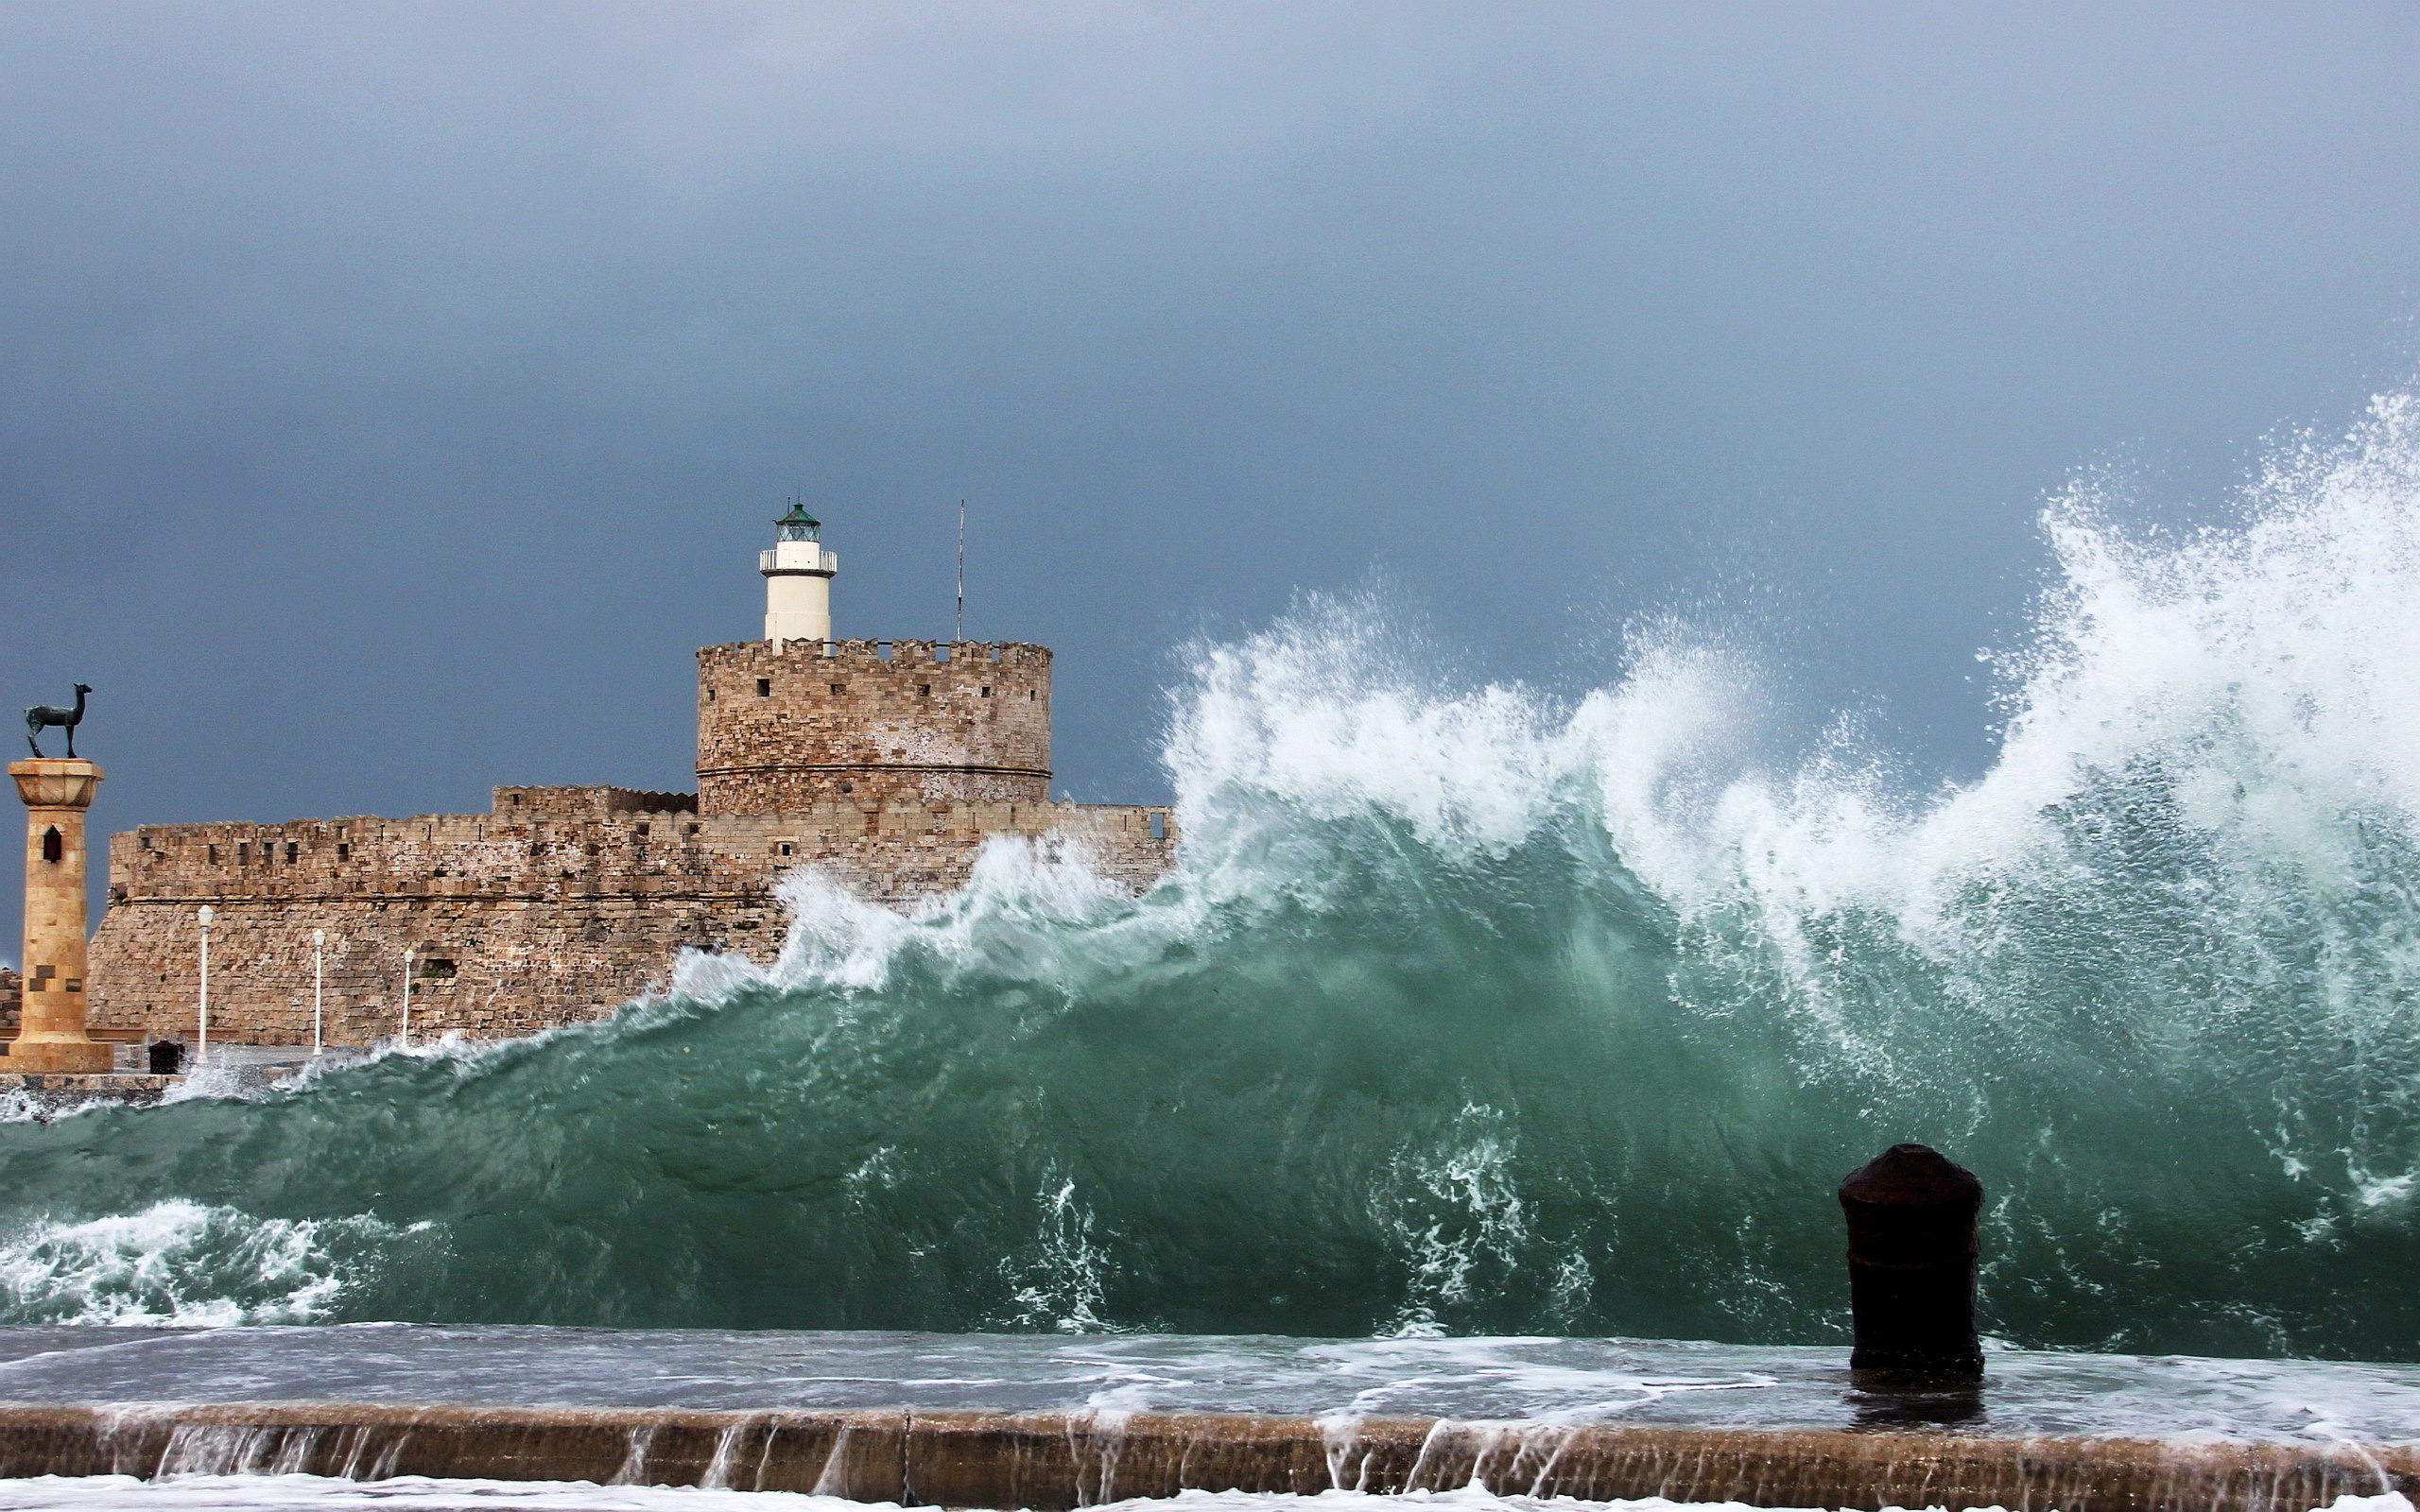 Huge shore waves